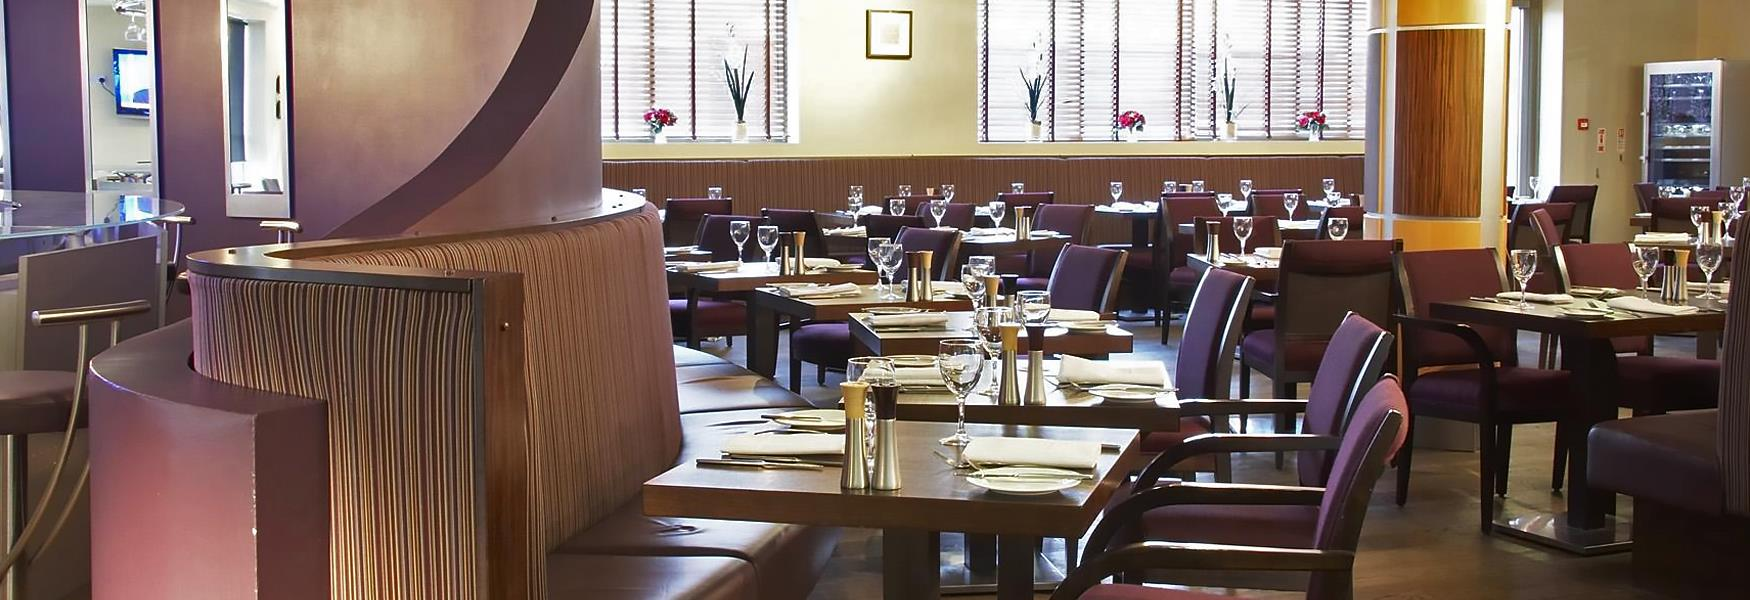 Crewe Hall Hotel Brasserie